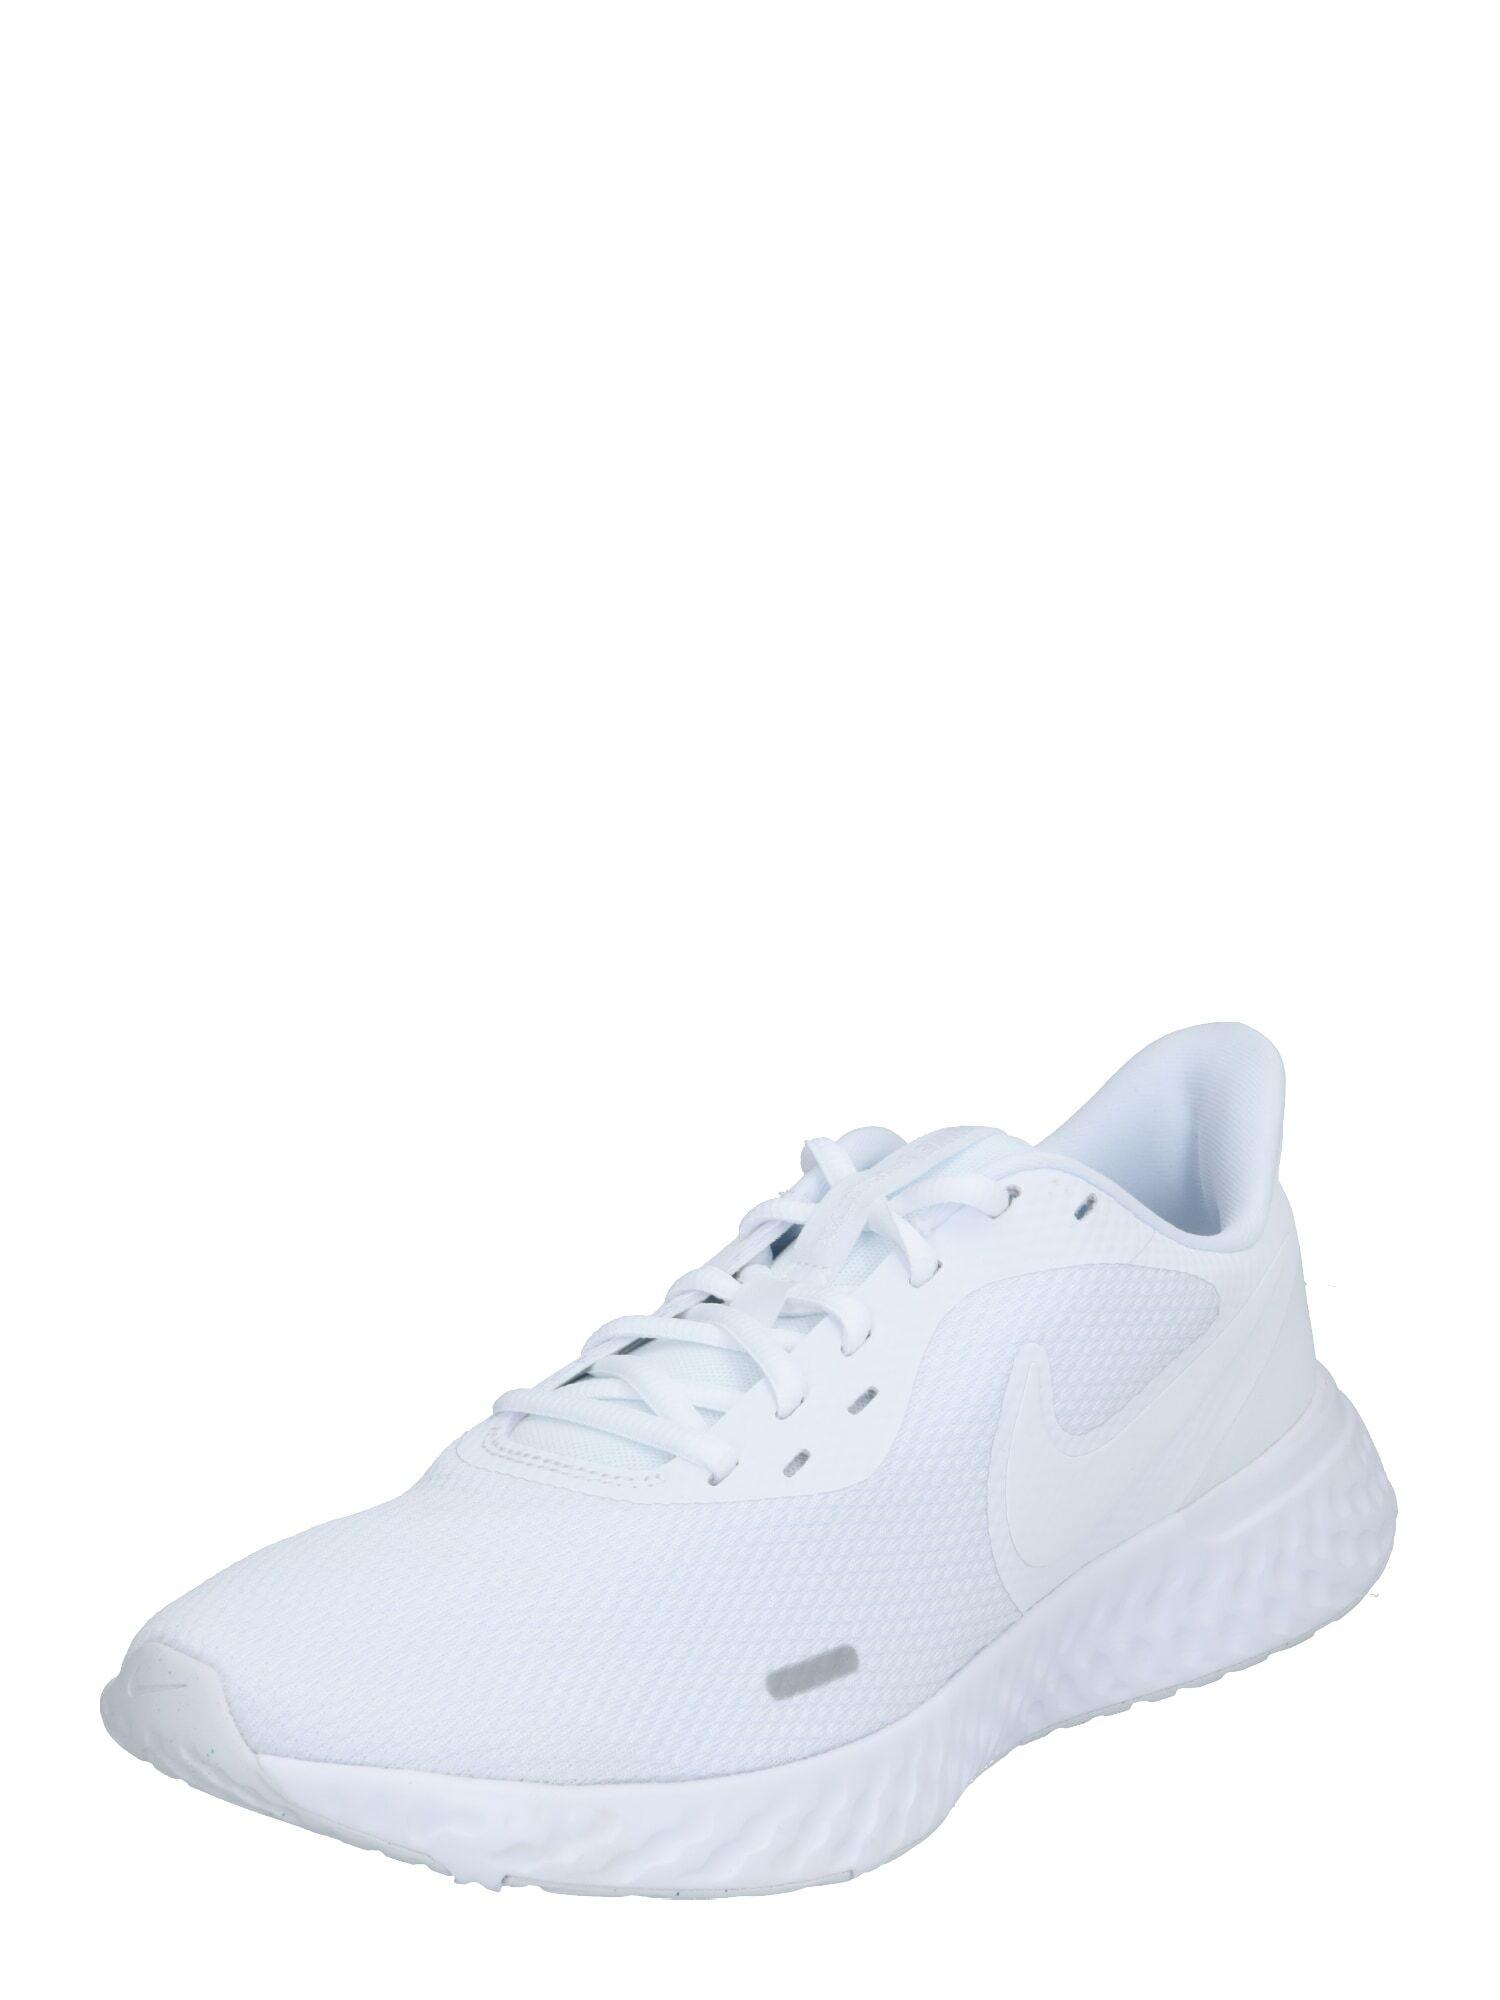 NIKE Chaussure de course 'Revolution 5'  - Blanc - Taille: 8.5 - female